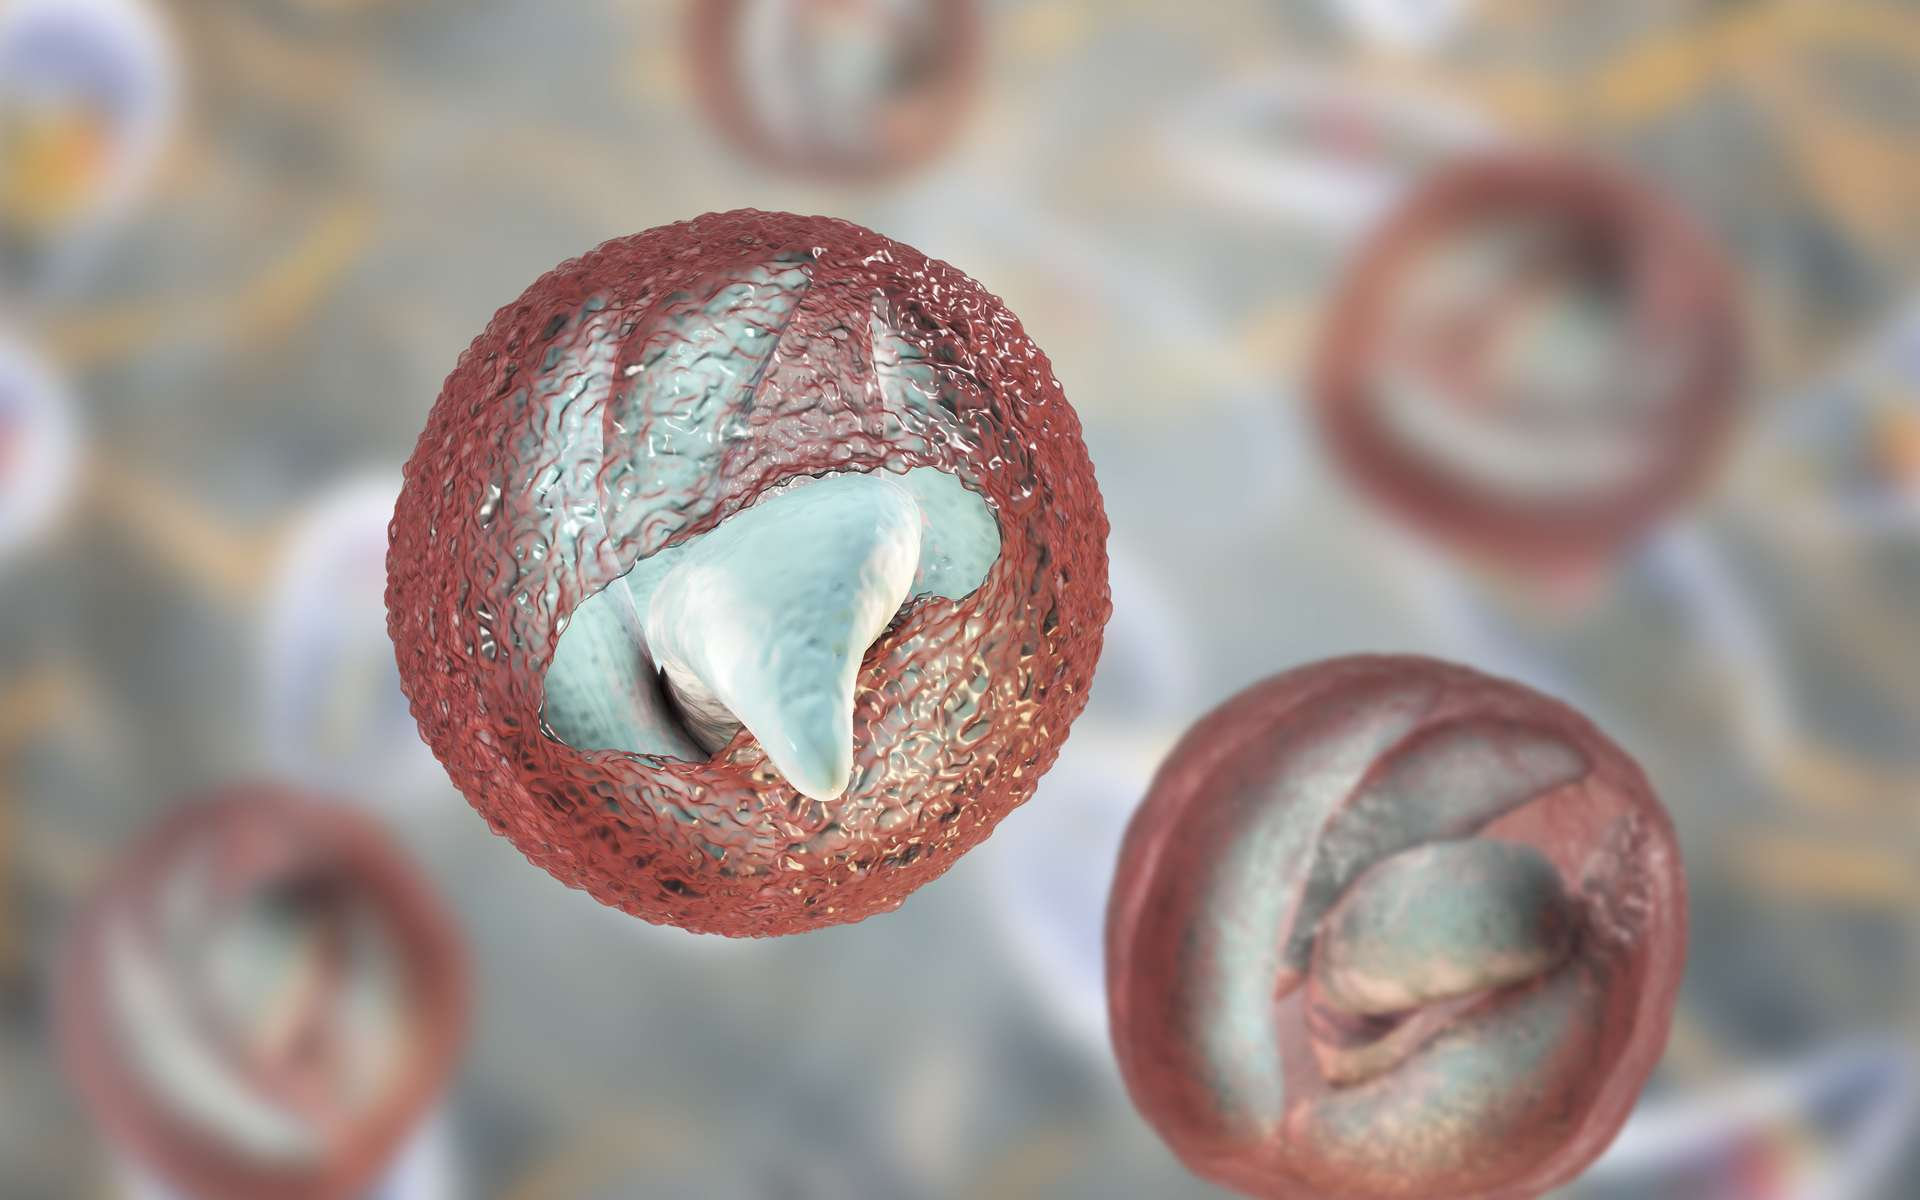 Chaque oocyste contient quatre sporozoïtes infectieux. © Kateryna Kon, Adobe Stock